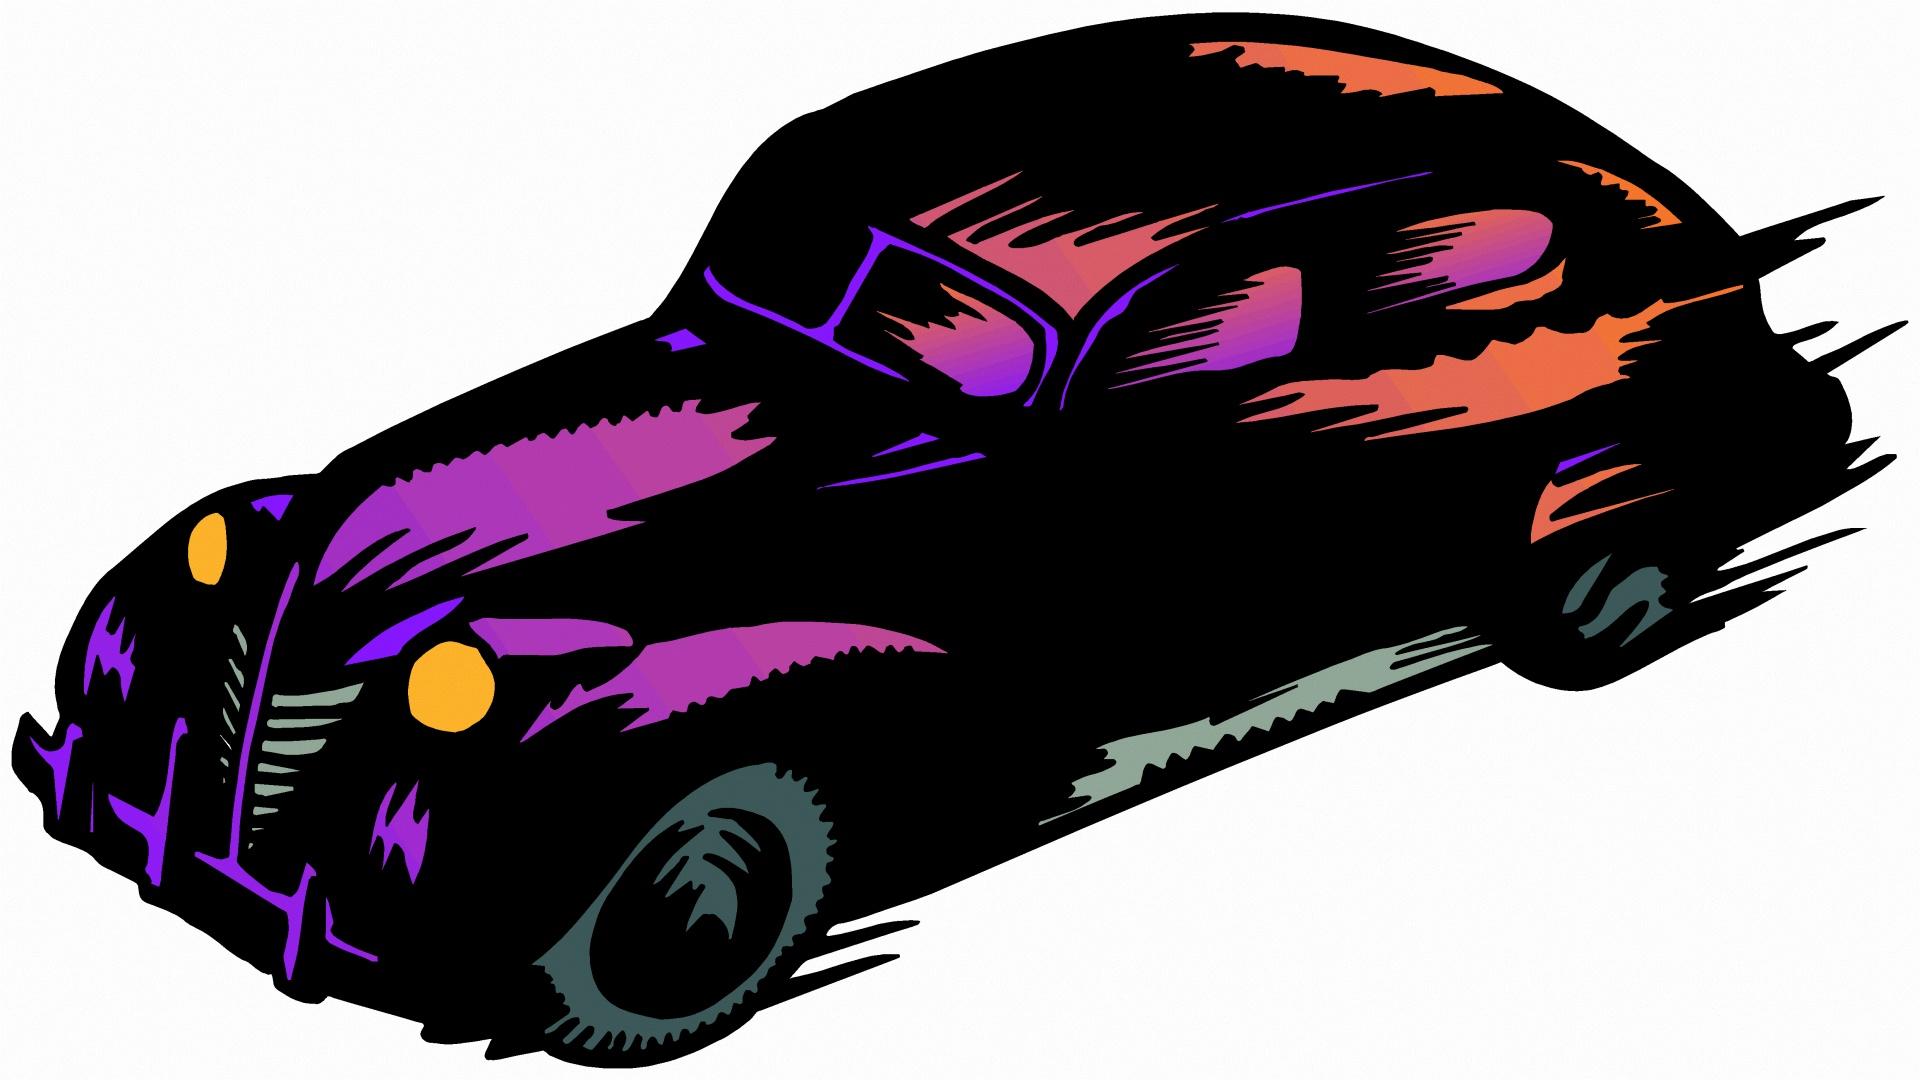 1920x1080 Cartoon Race Car Pictures